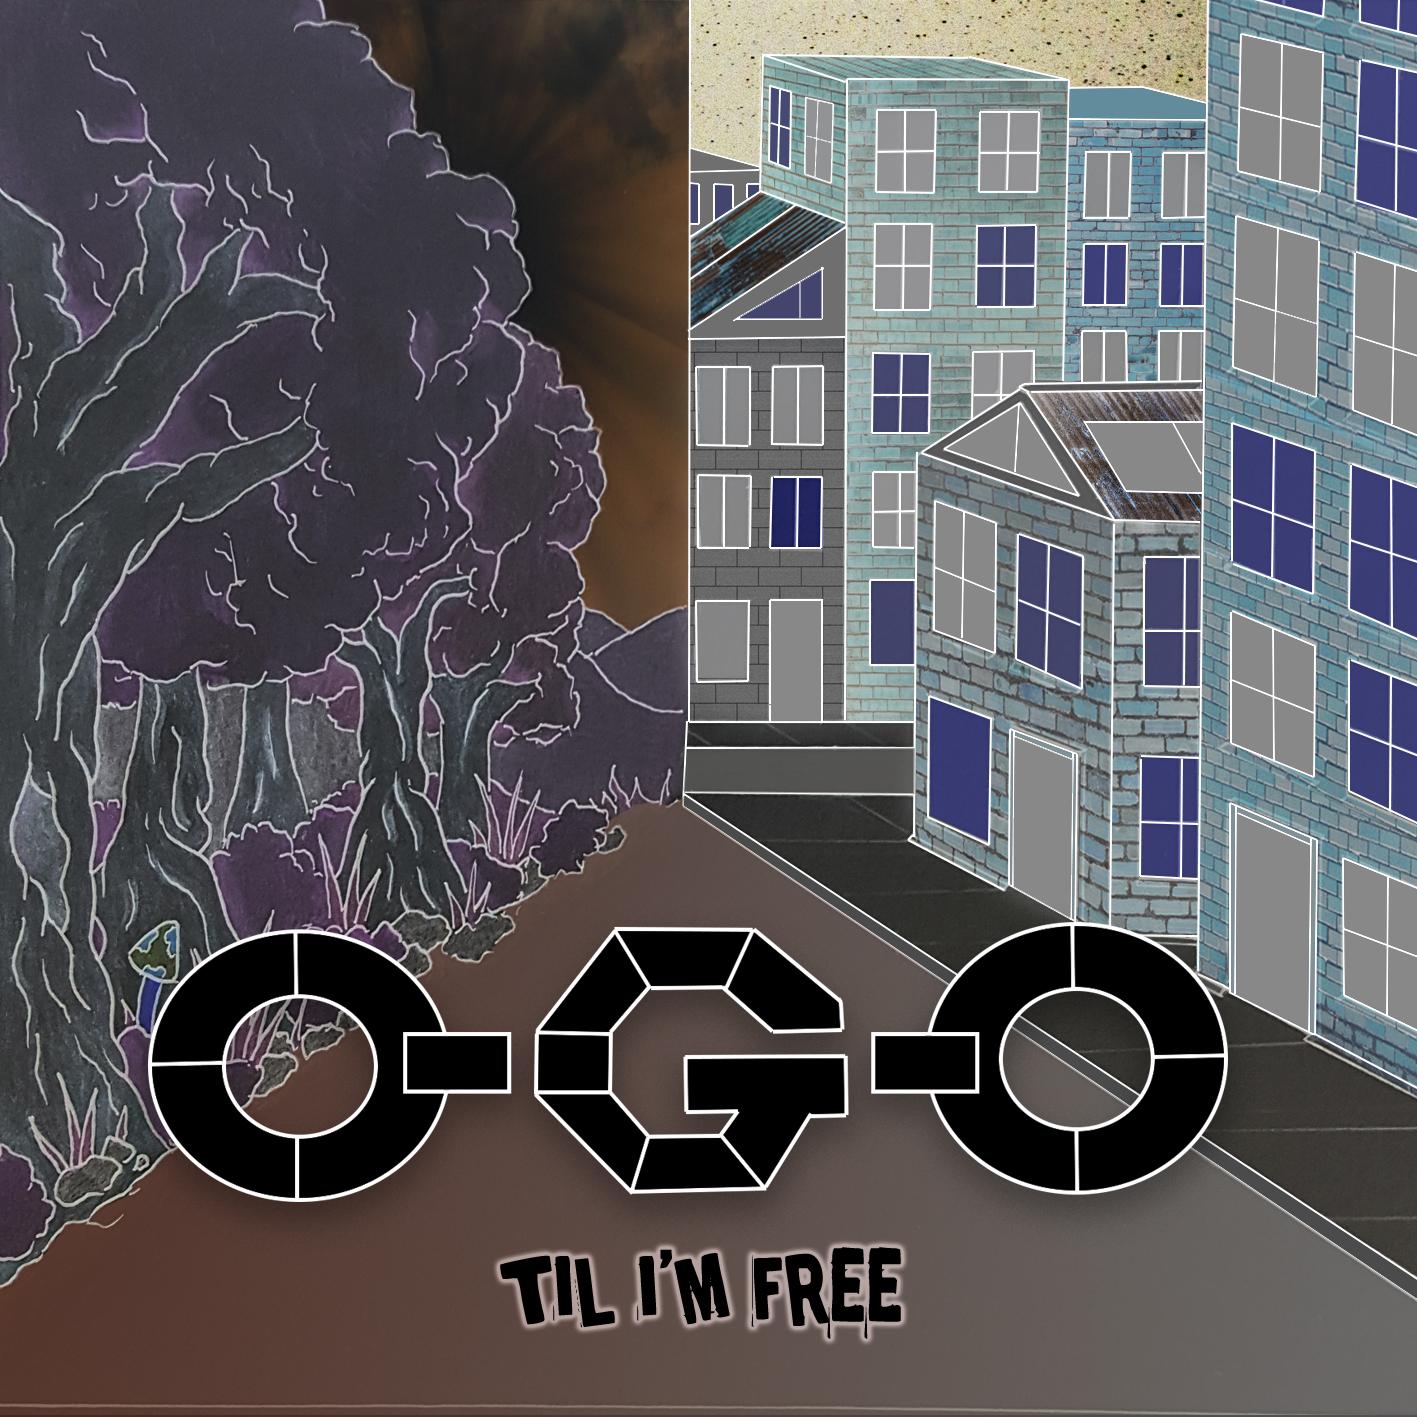 O-G-O 'Til I'm Free' E.P cover art (2017)